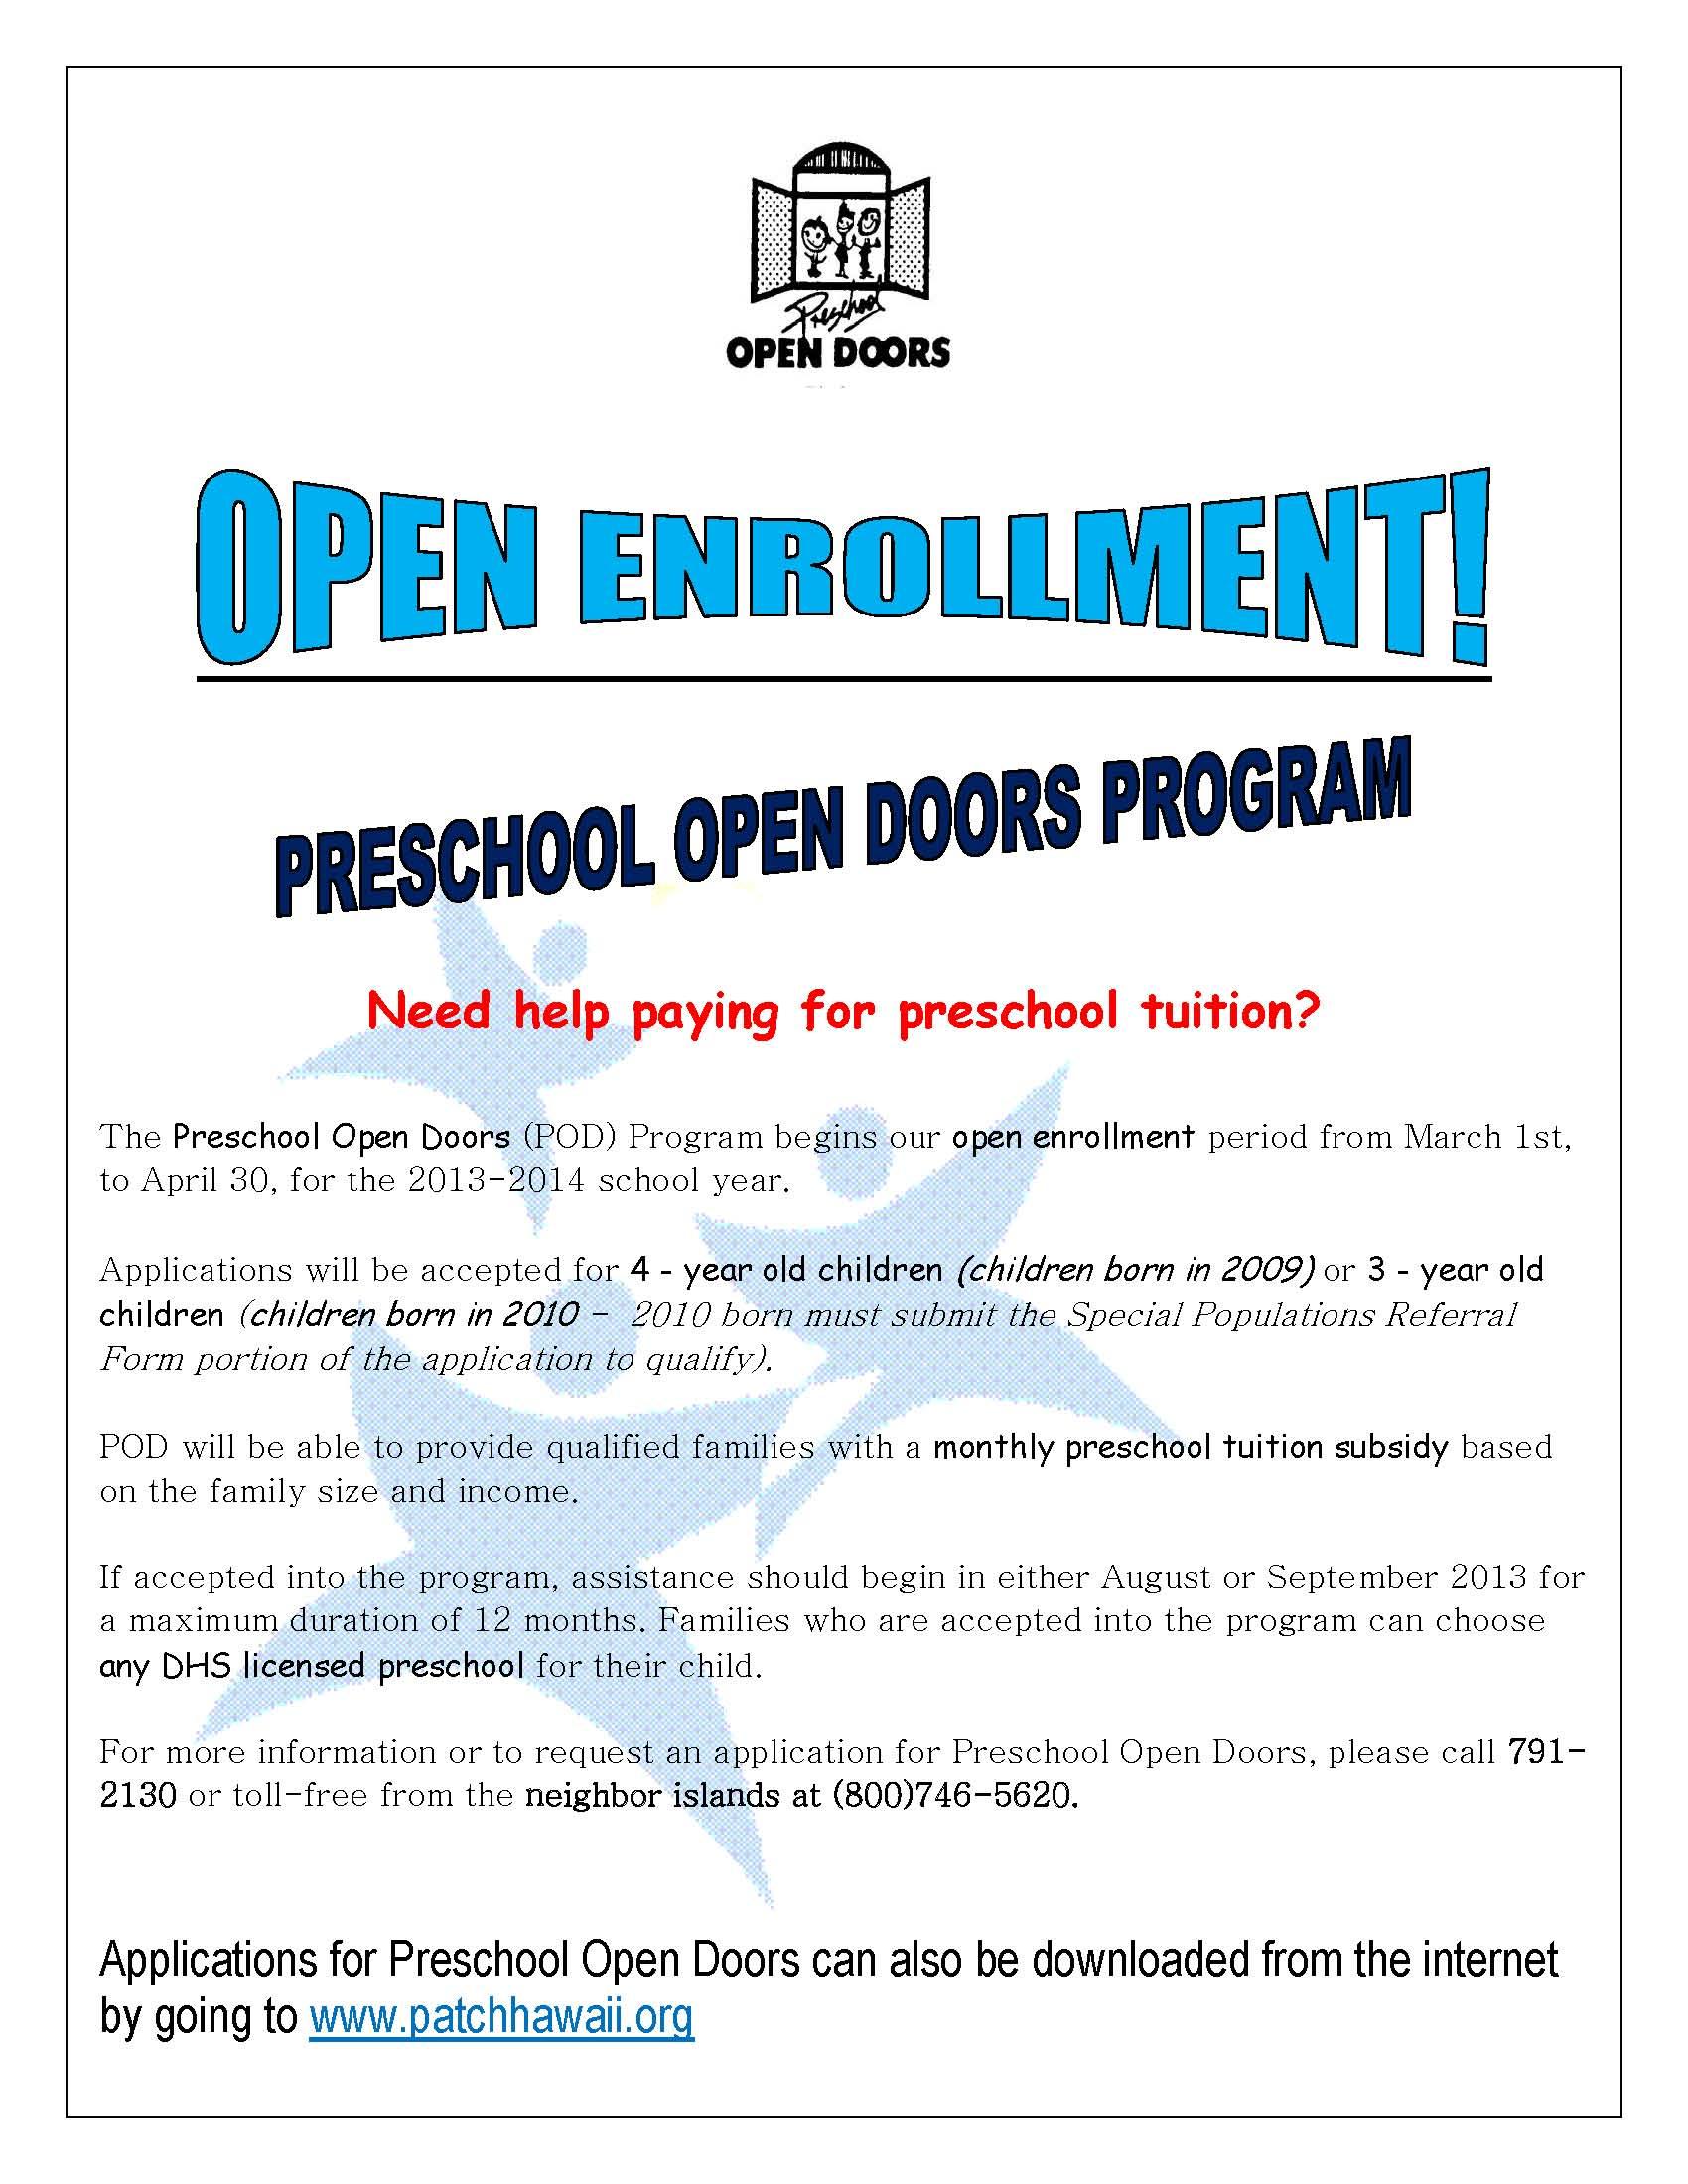 sample open enrollment letter to employees school sample of flyers